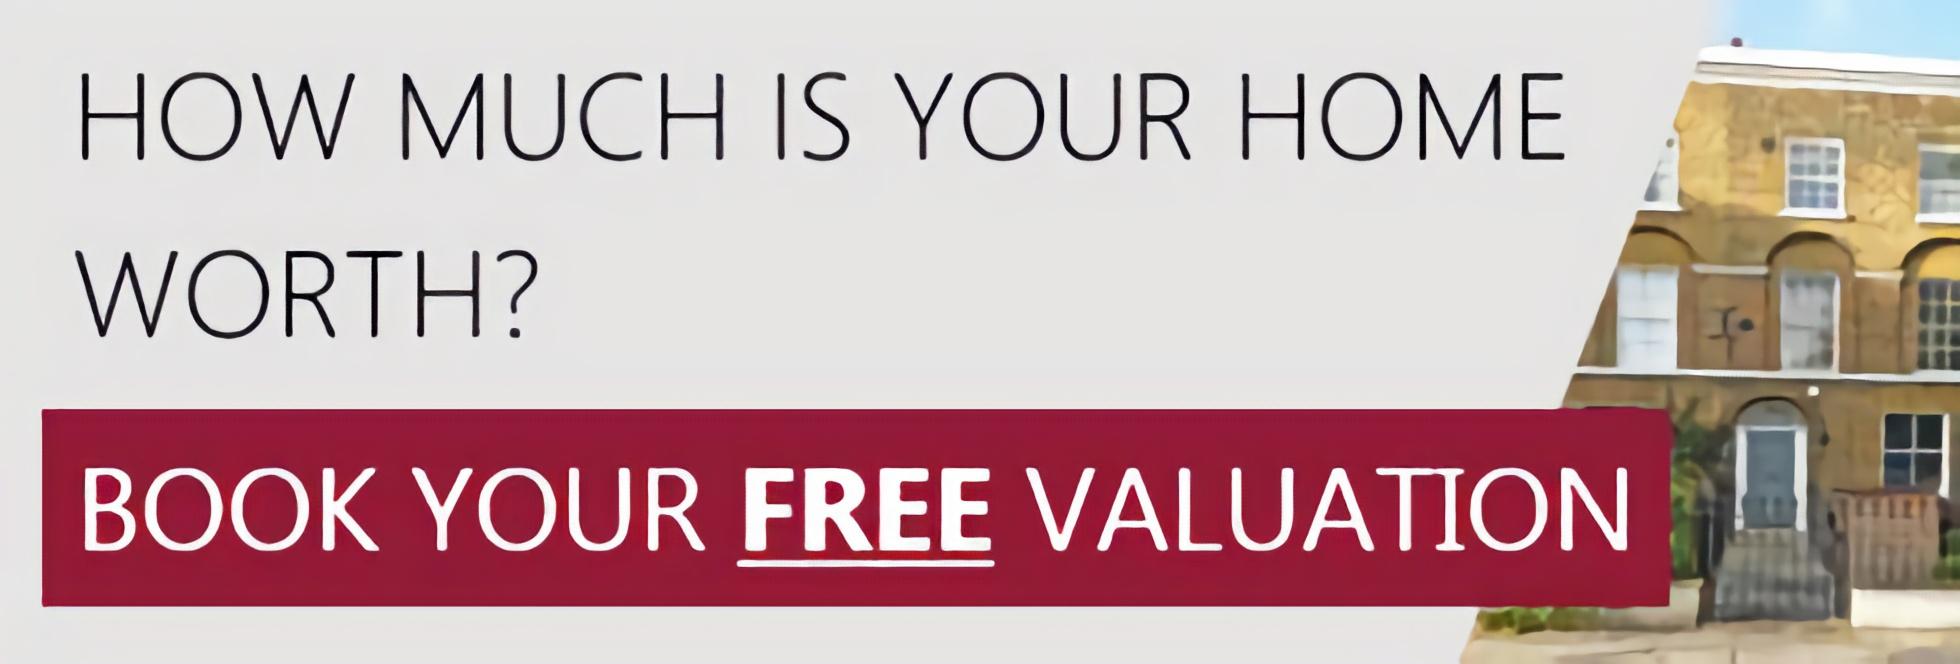 valuation image